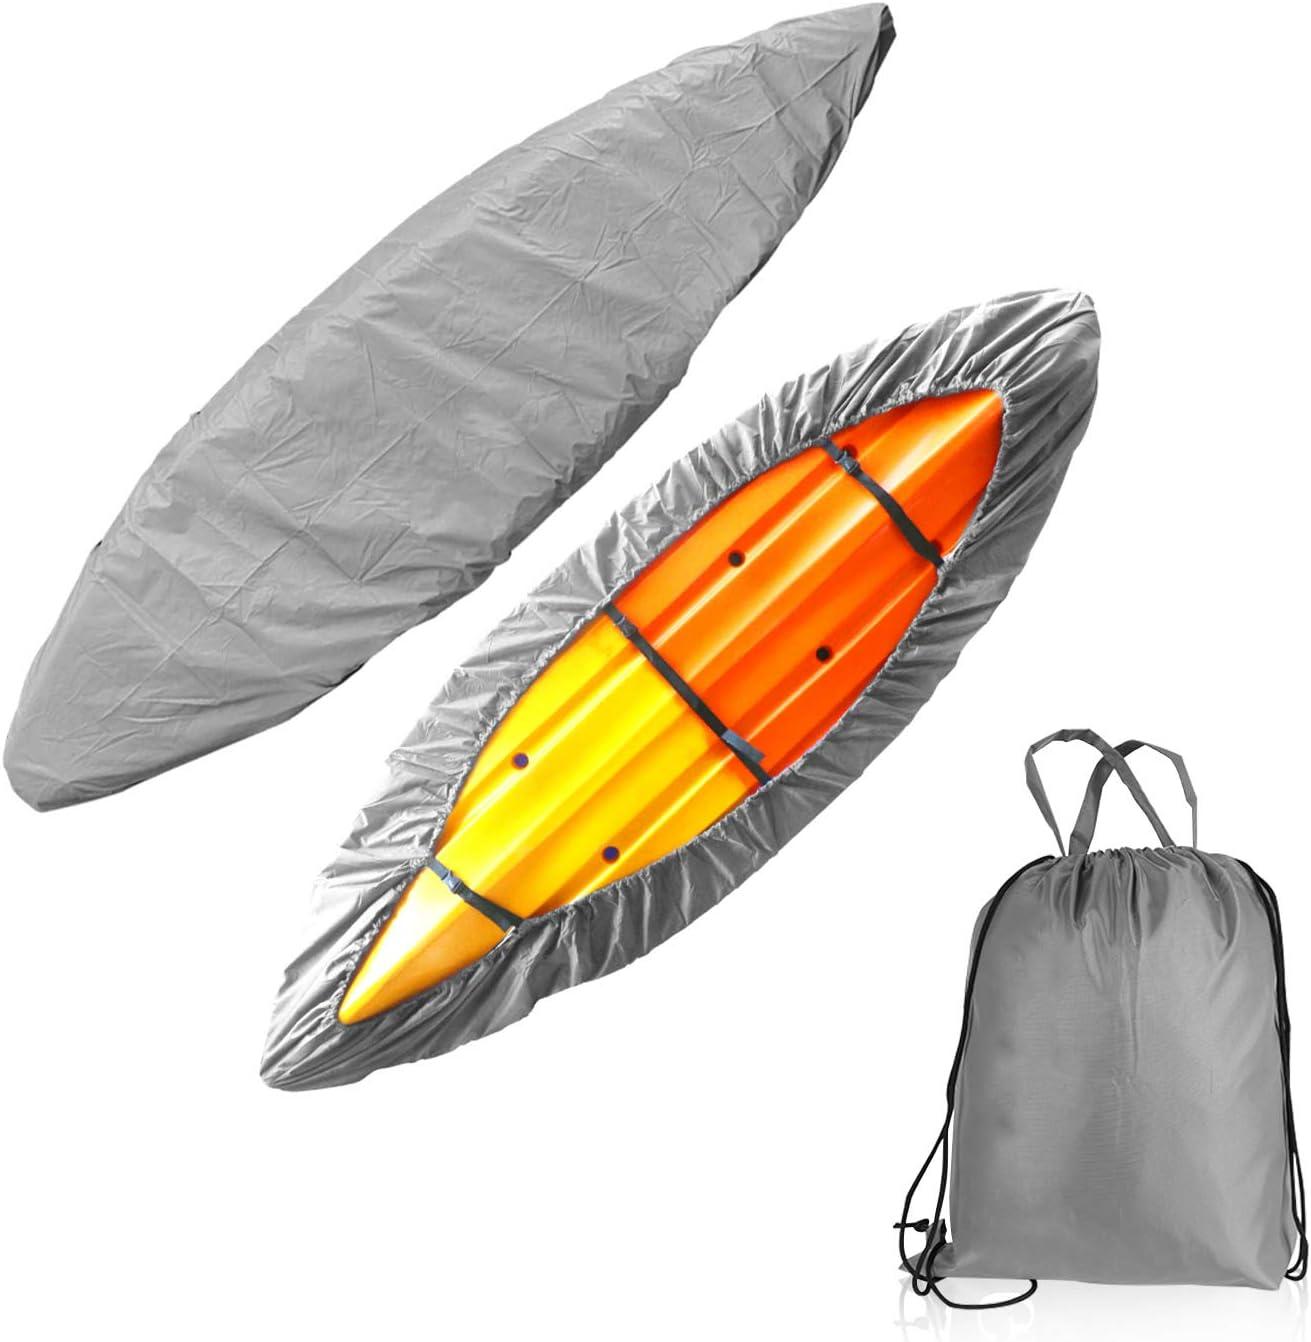 3.5MWaterproof Fishing Kayak Boat Canoe Storage Cover Bag Dust UV Sun Protection